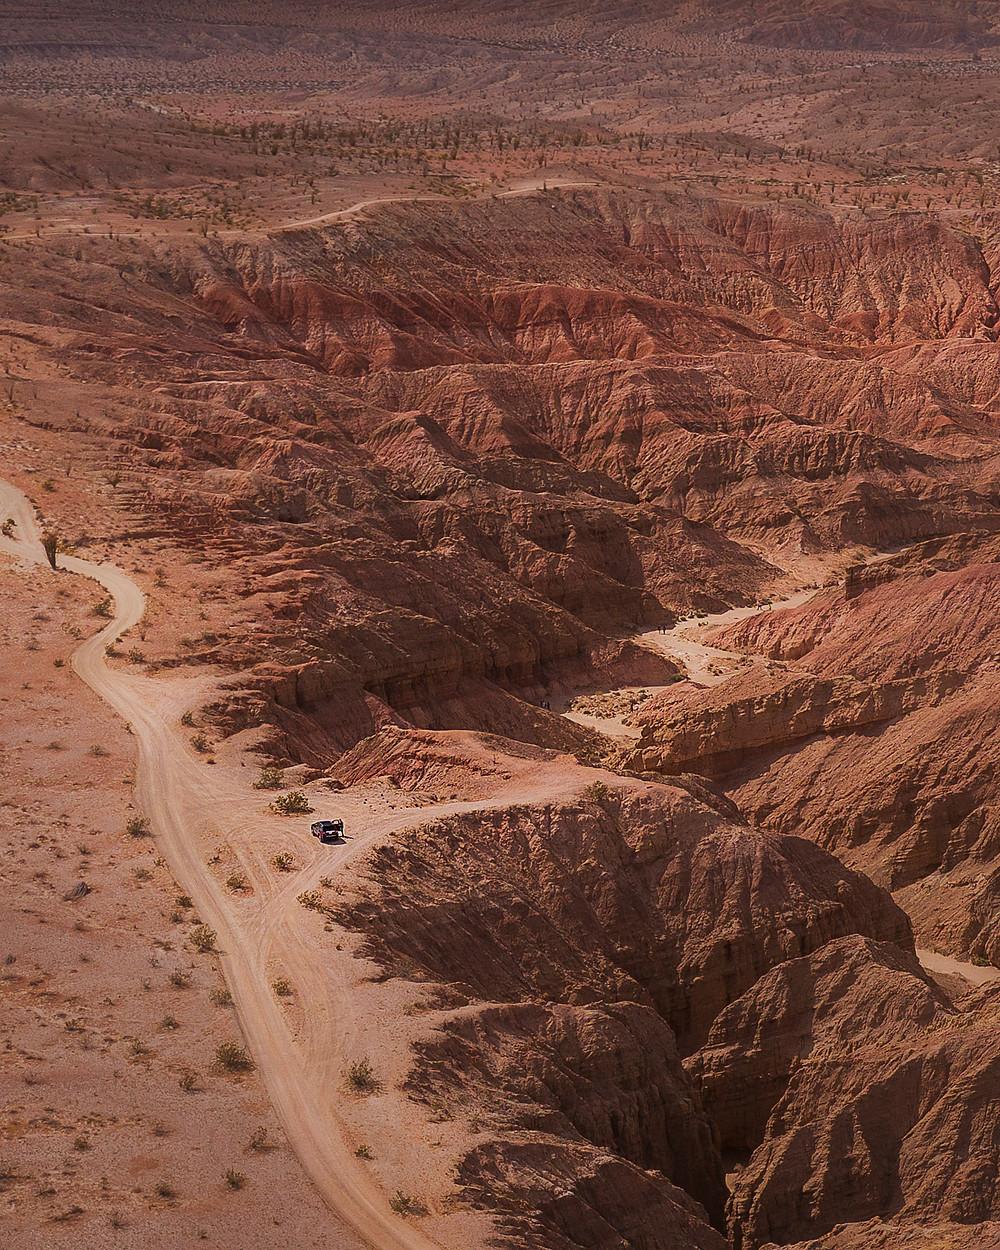 off roading in the desert slot canyons